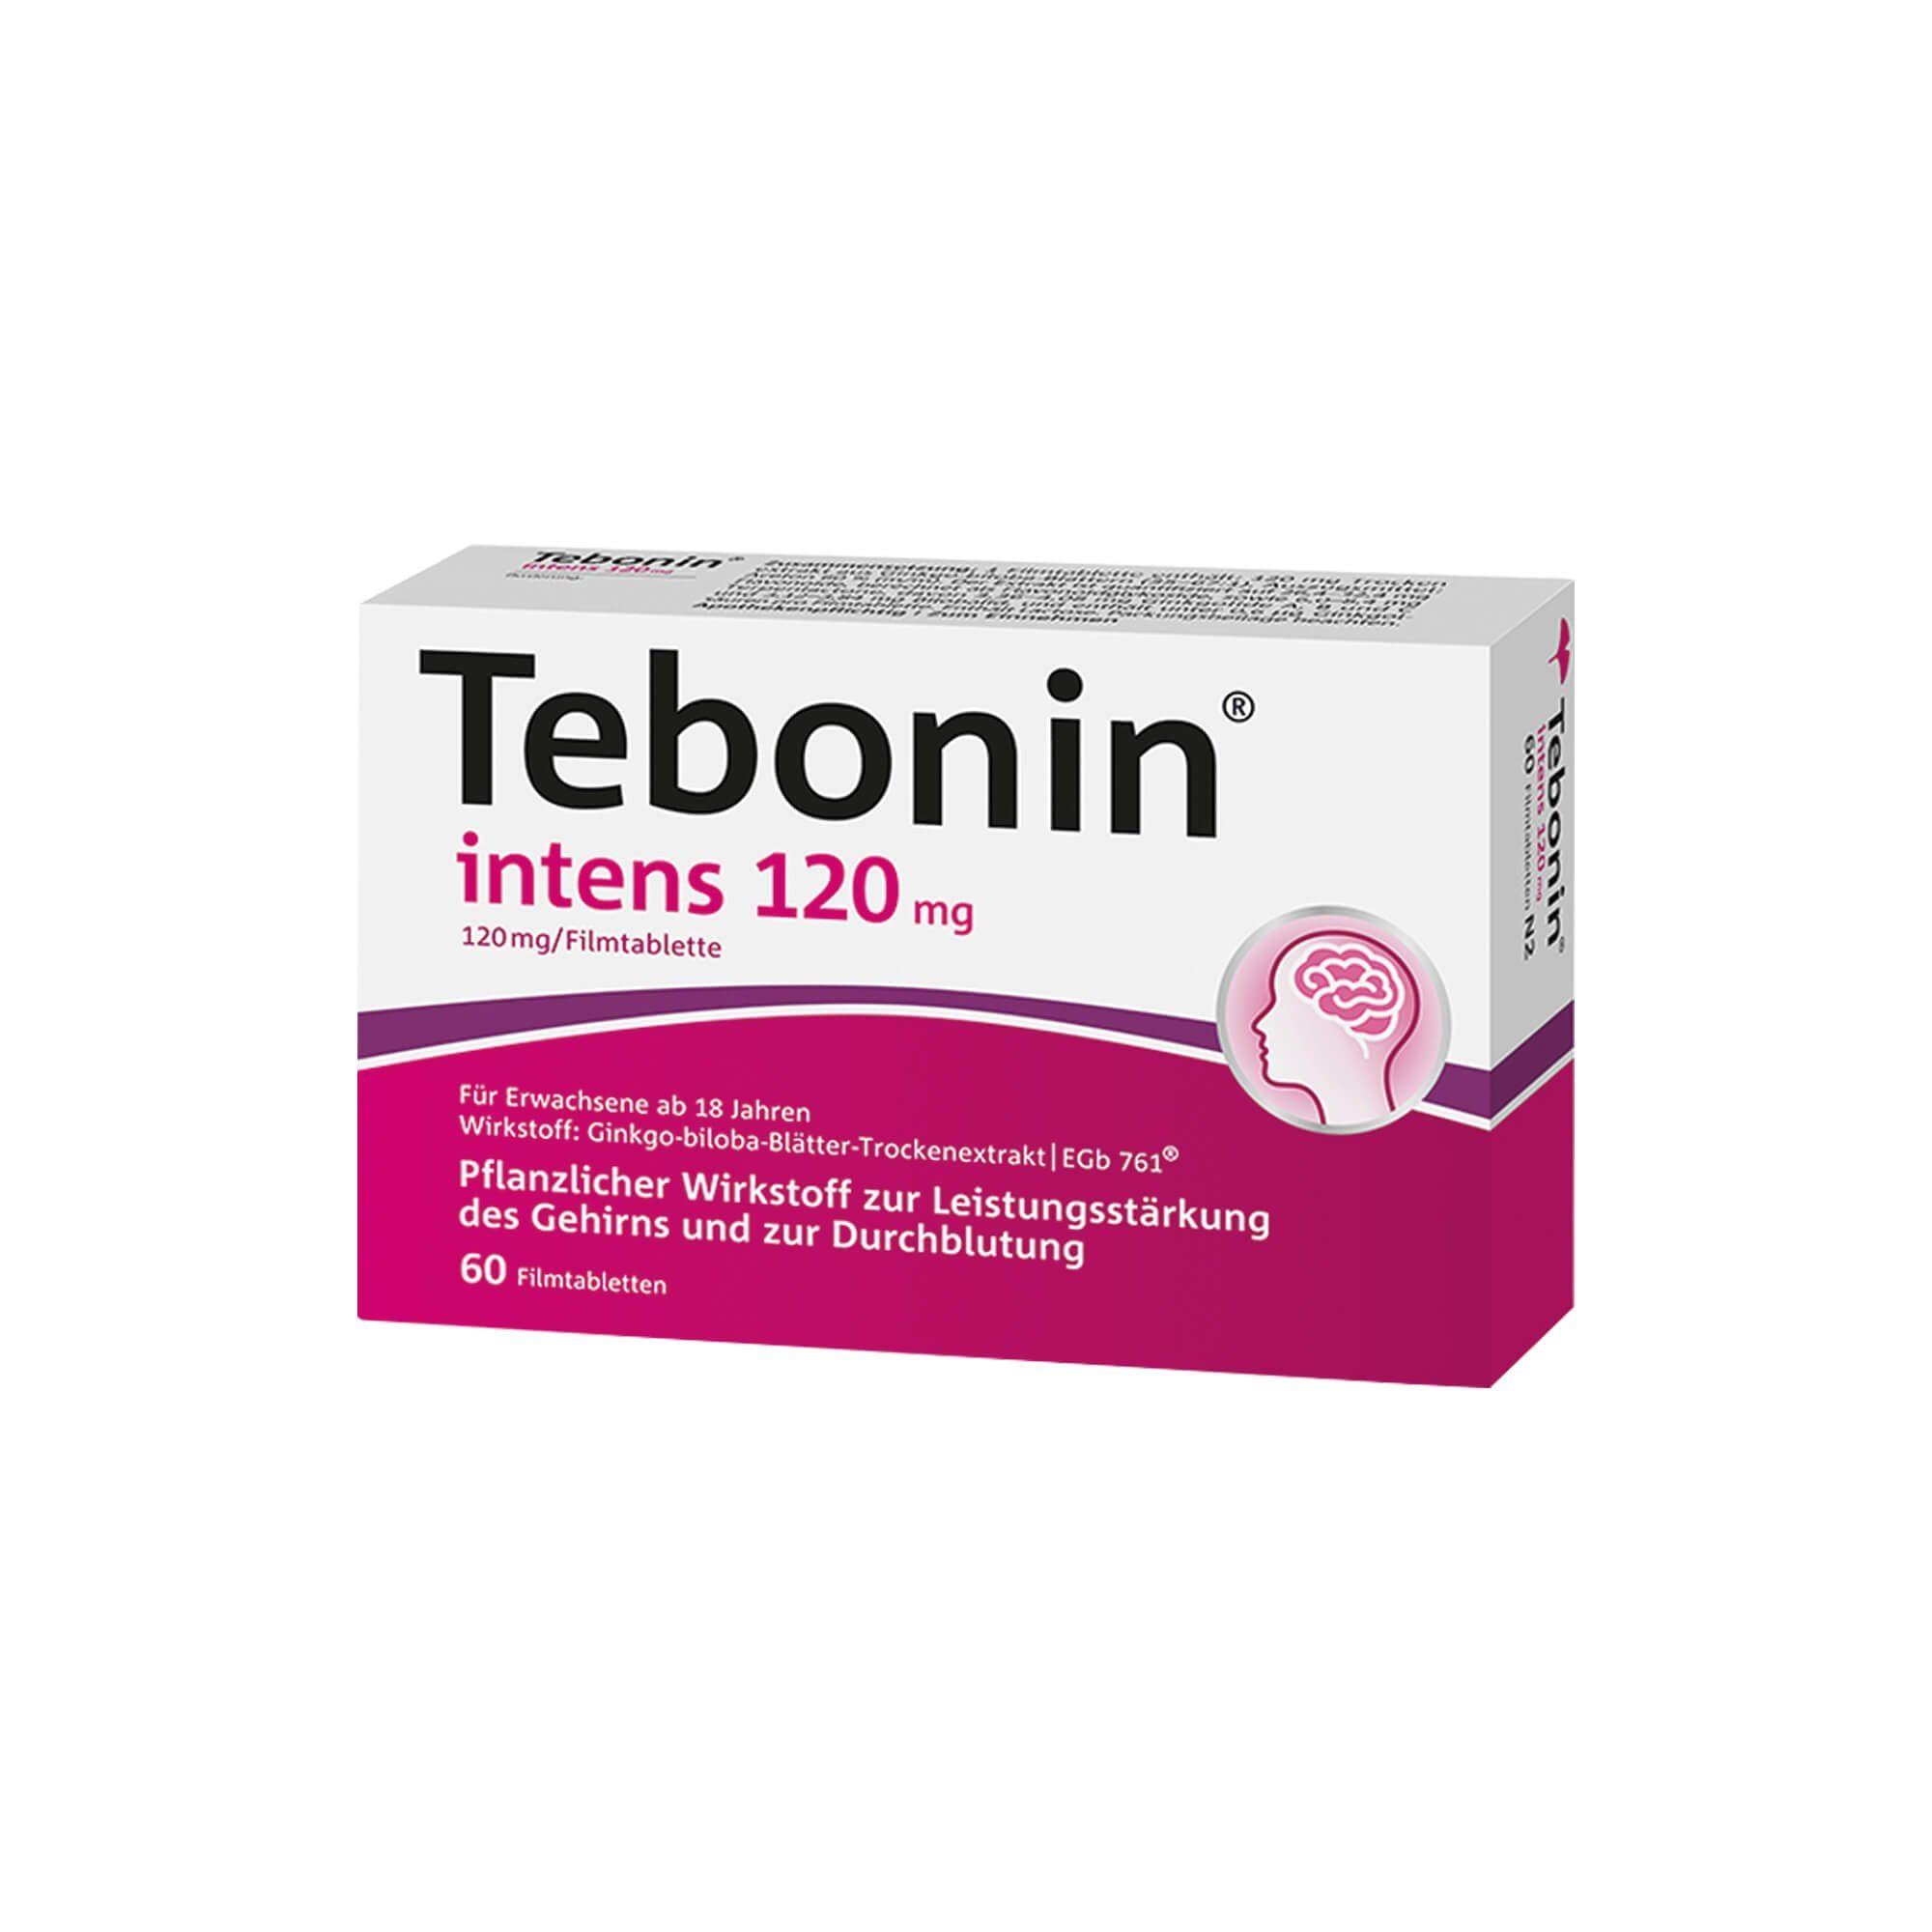 Tebonin intens 120 mg, 60 St